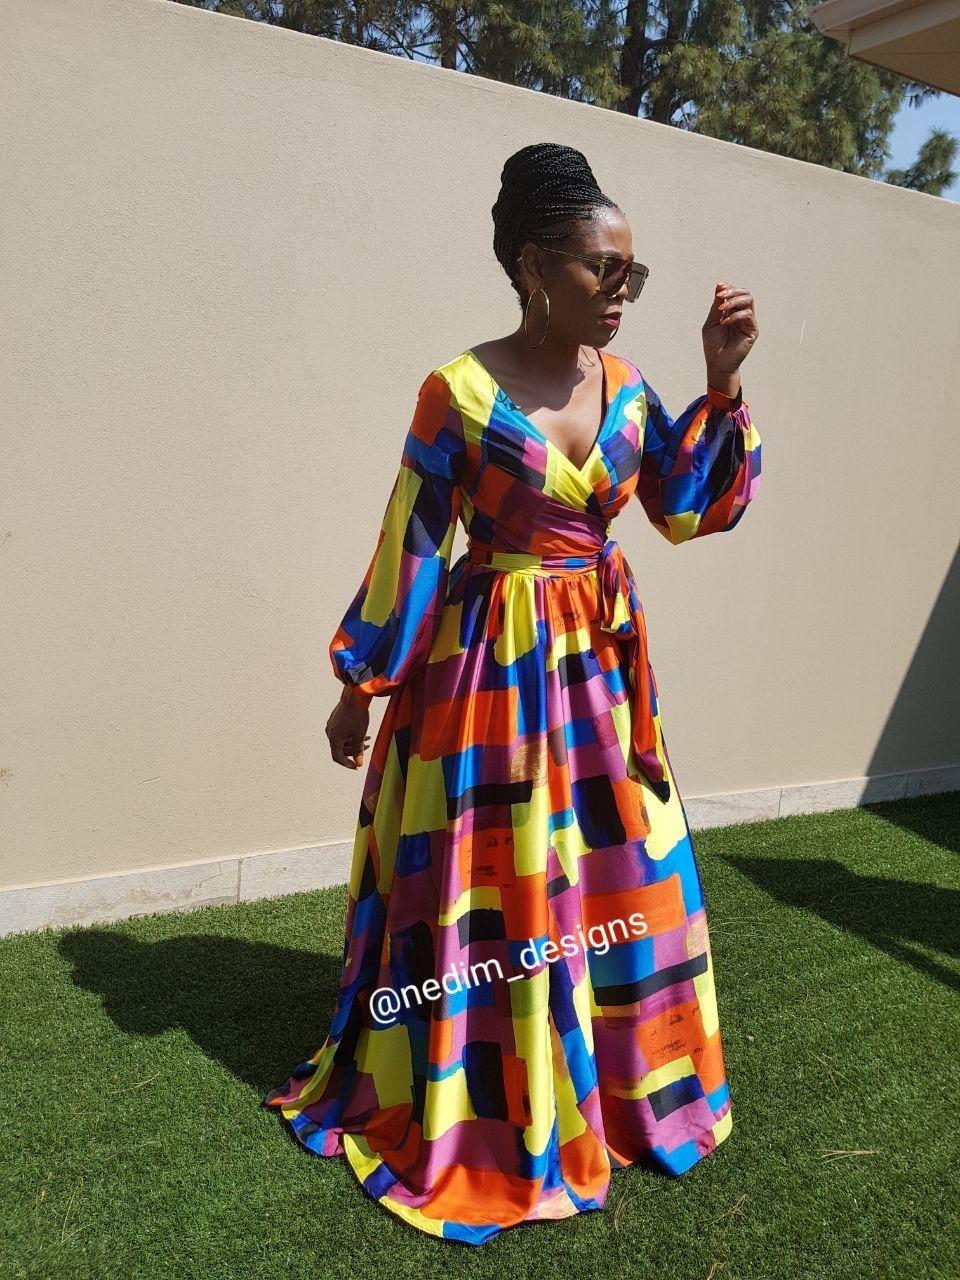 Nedimdesigns african design pinterest africans african